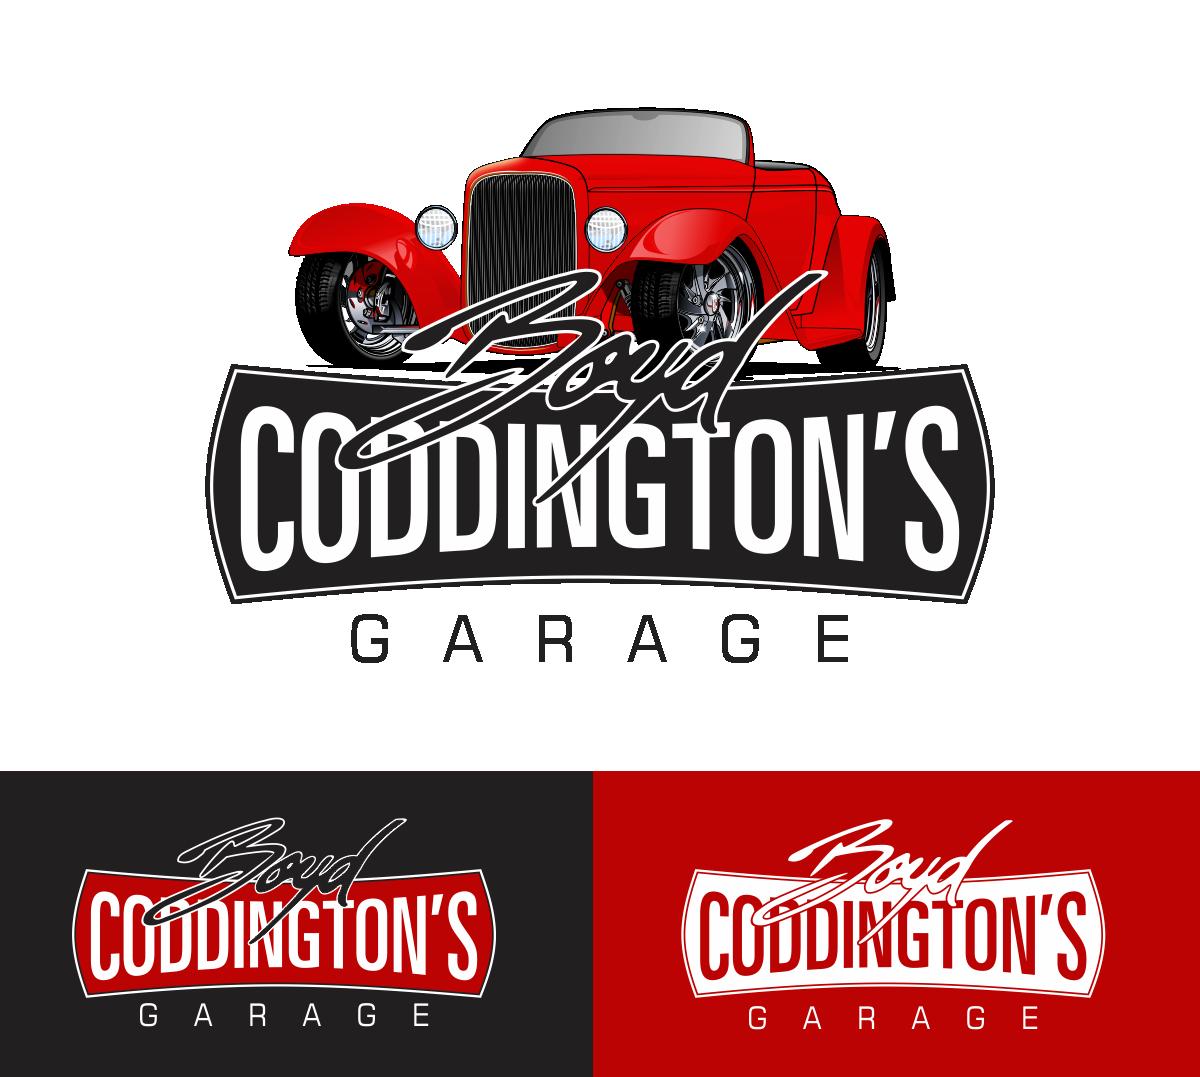 serious modern garage logo design for boyd coddingtons